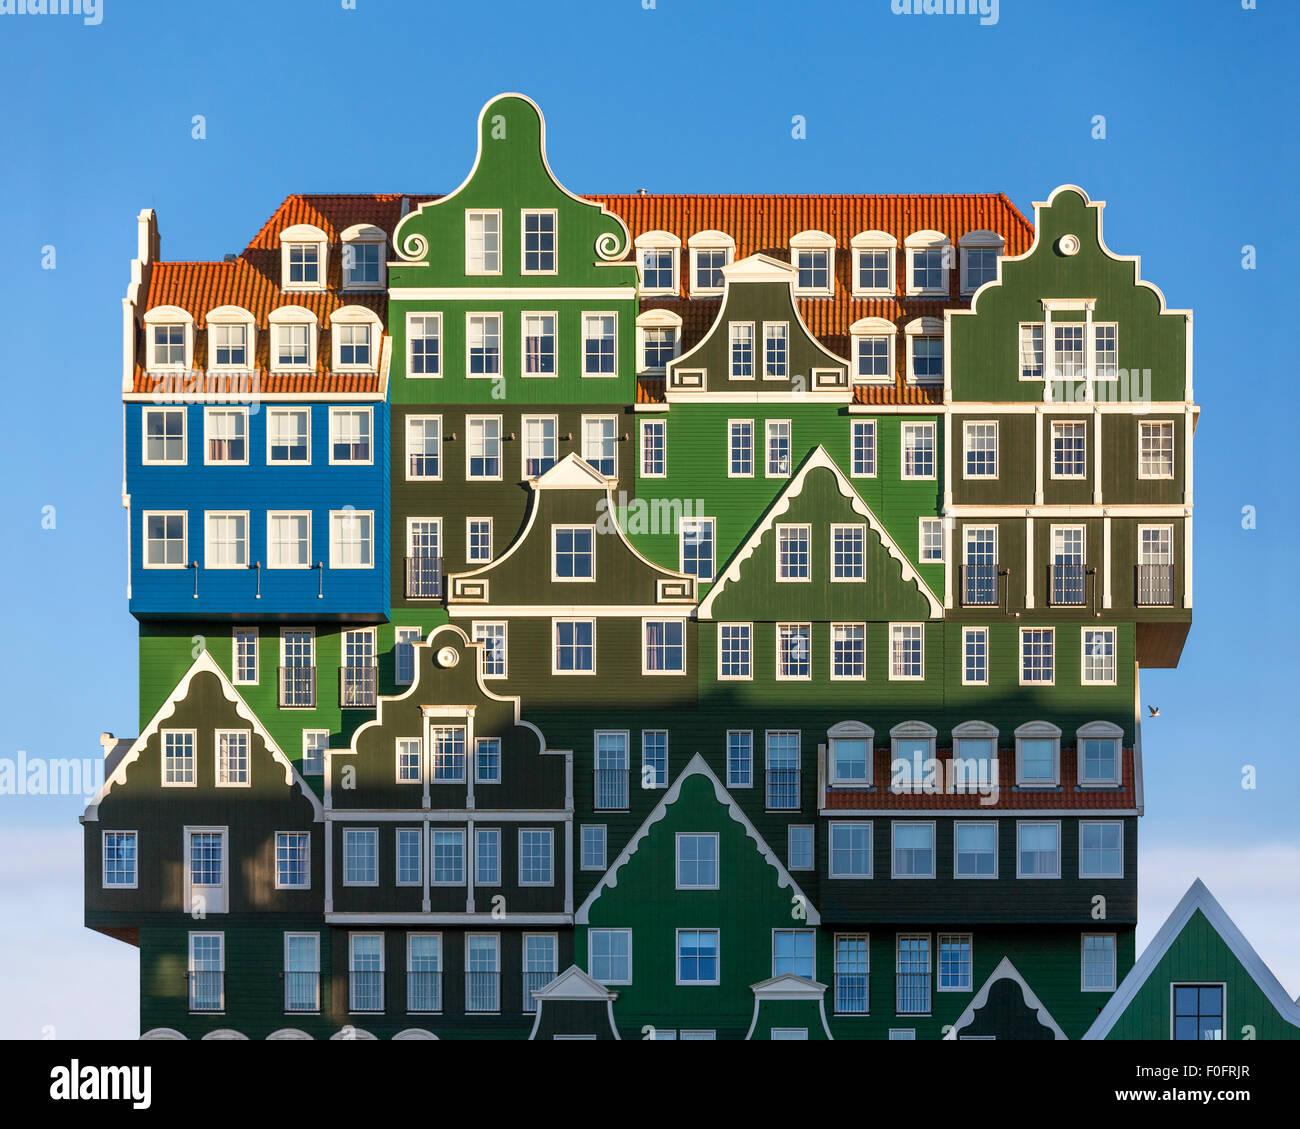 https://c7.alamy.com/comp/F0FRJR/inntel-hotel-in-zaandam-holland-F0FRJR.jpg